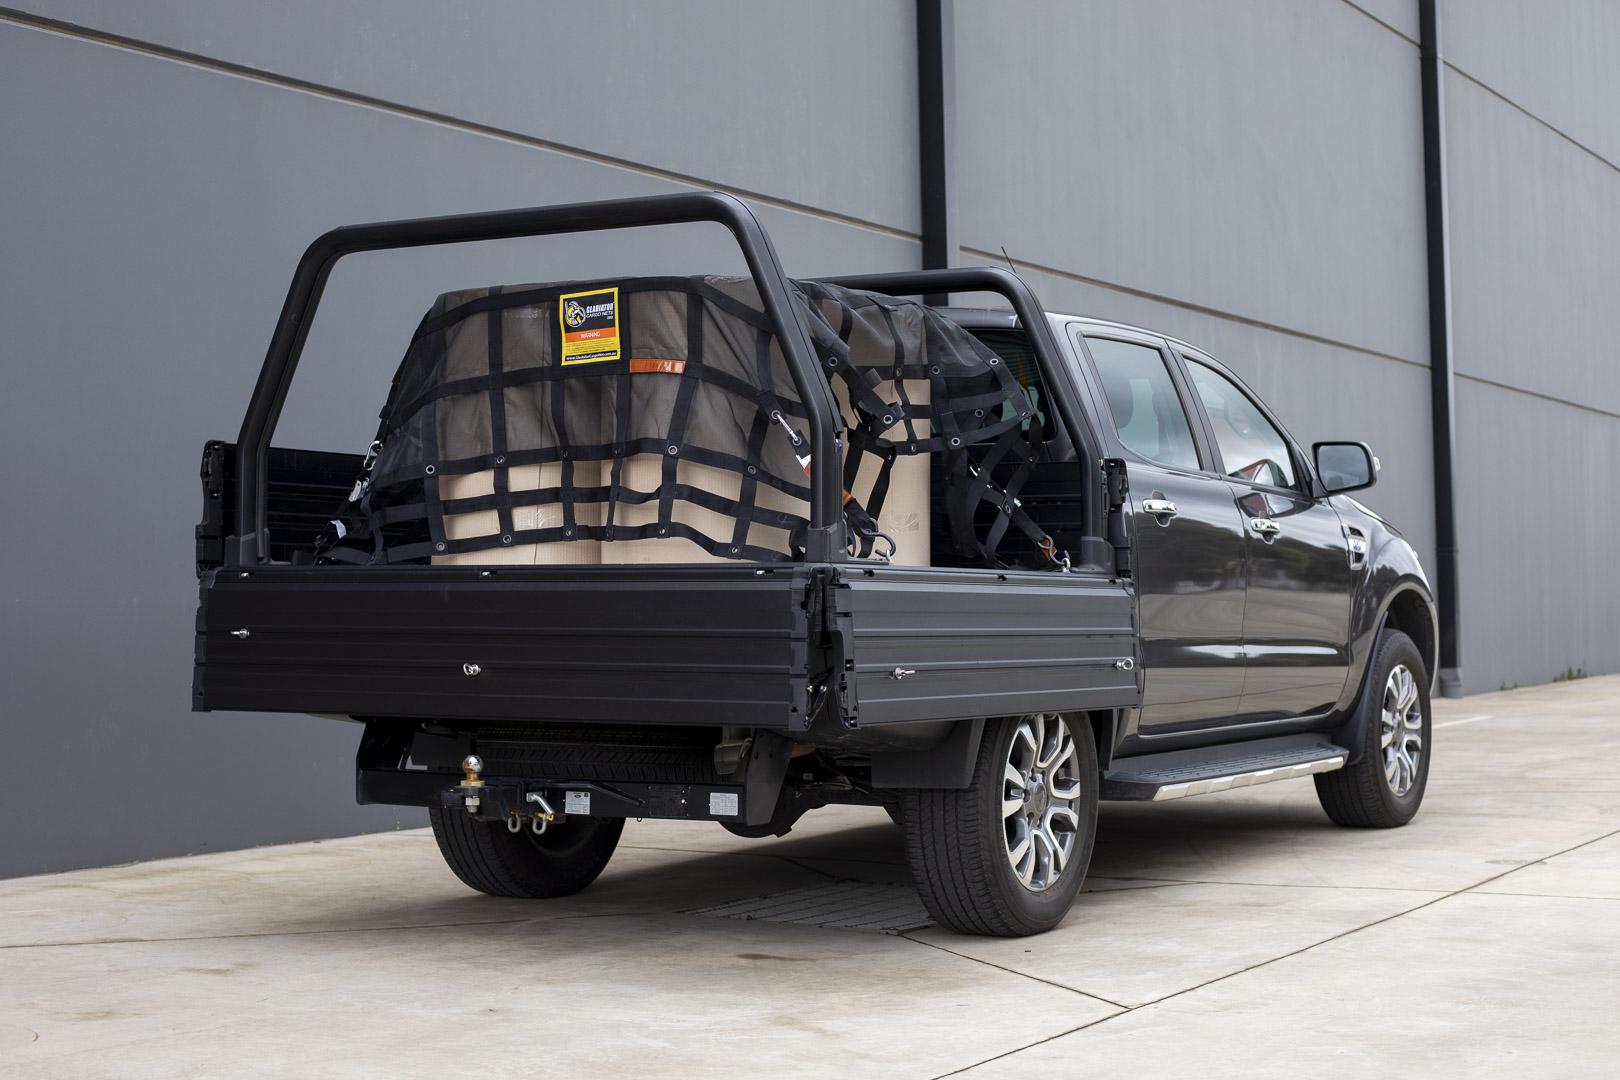 Comtruk ute tray with XT150 rack bars and Gladiator Cargo Net